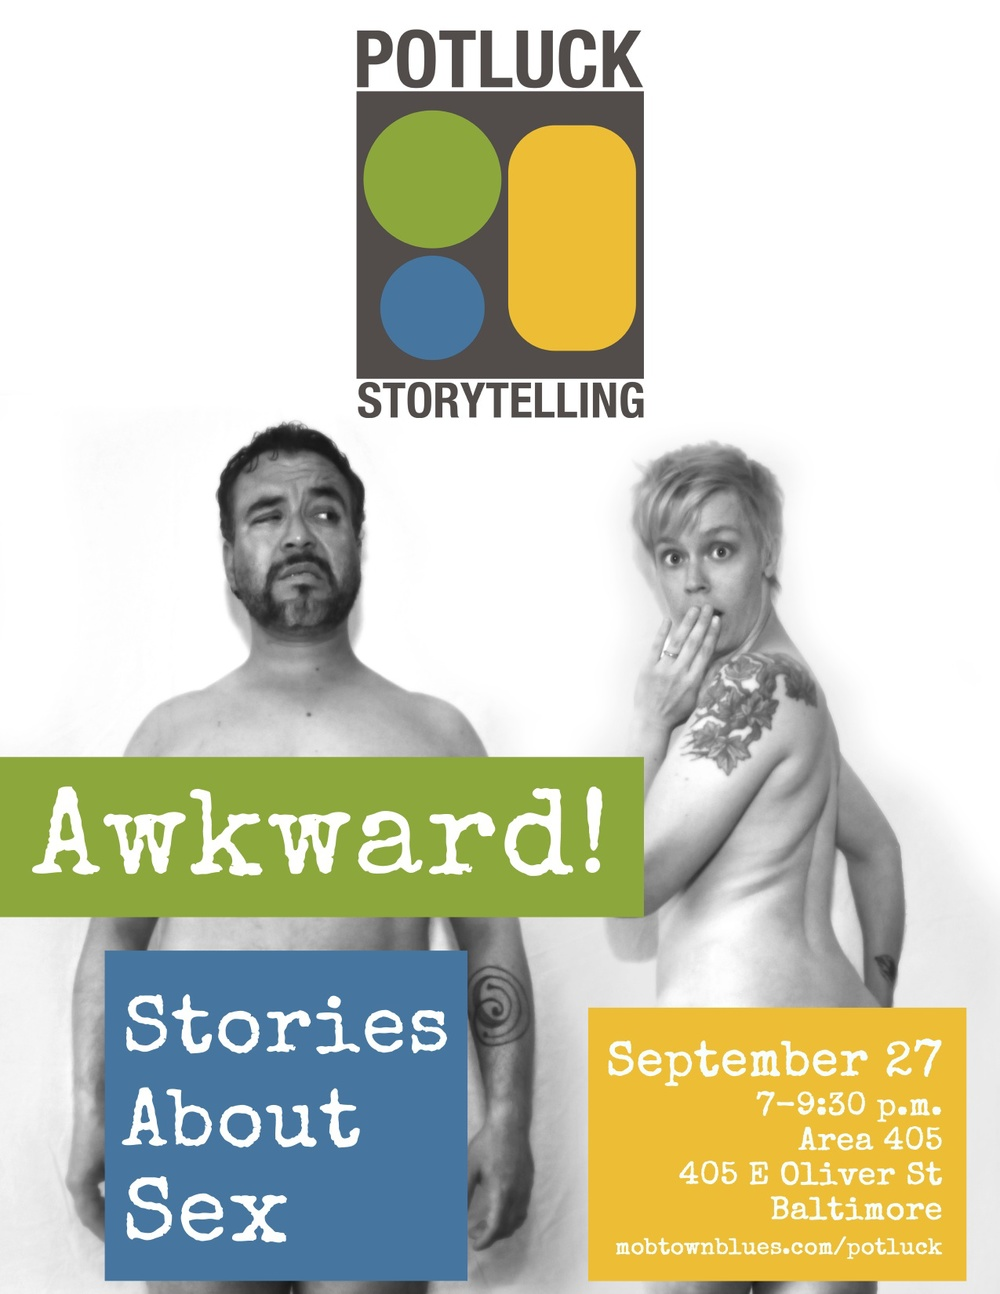 potluck story-awkward poster.jpg